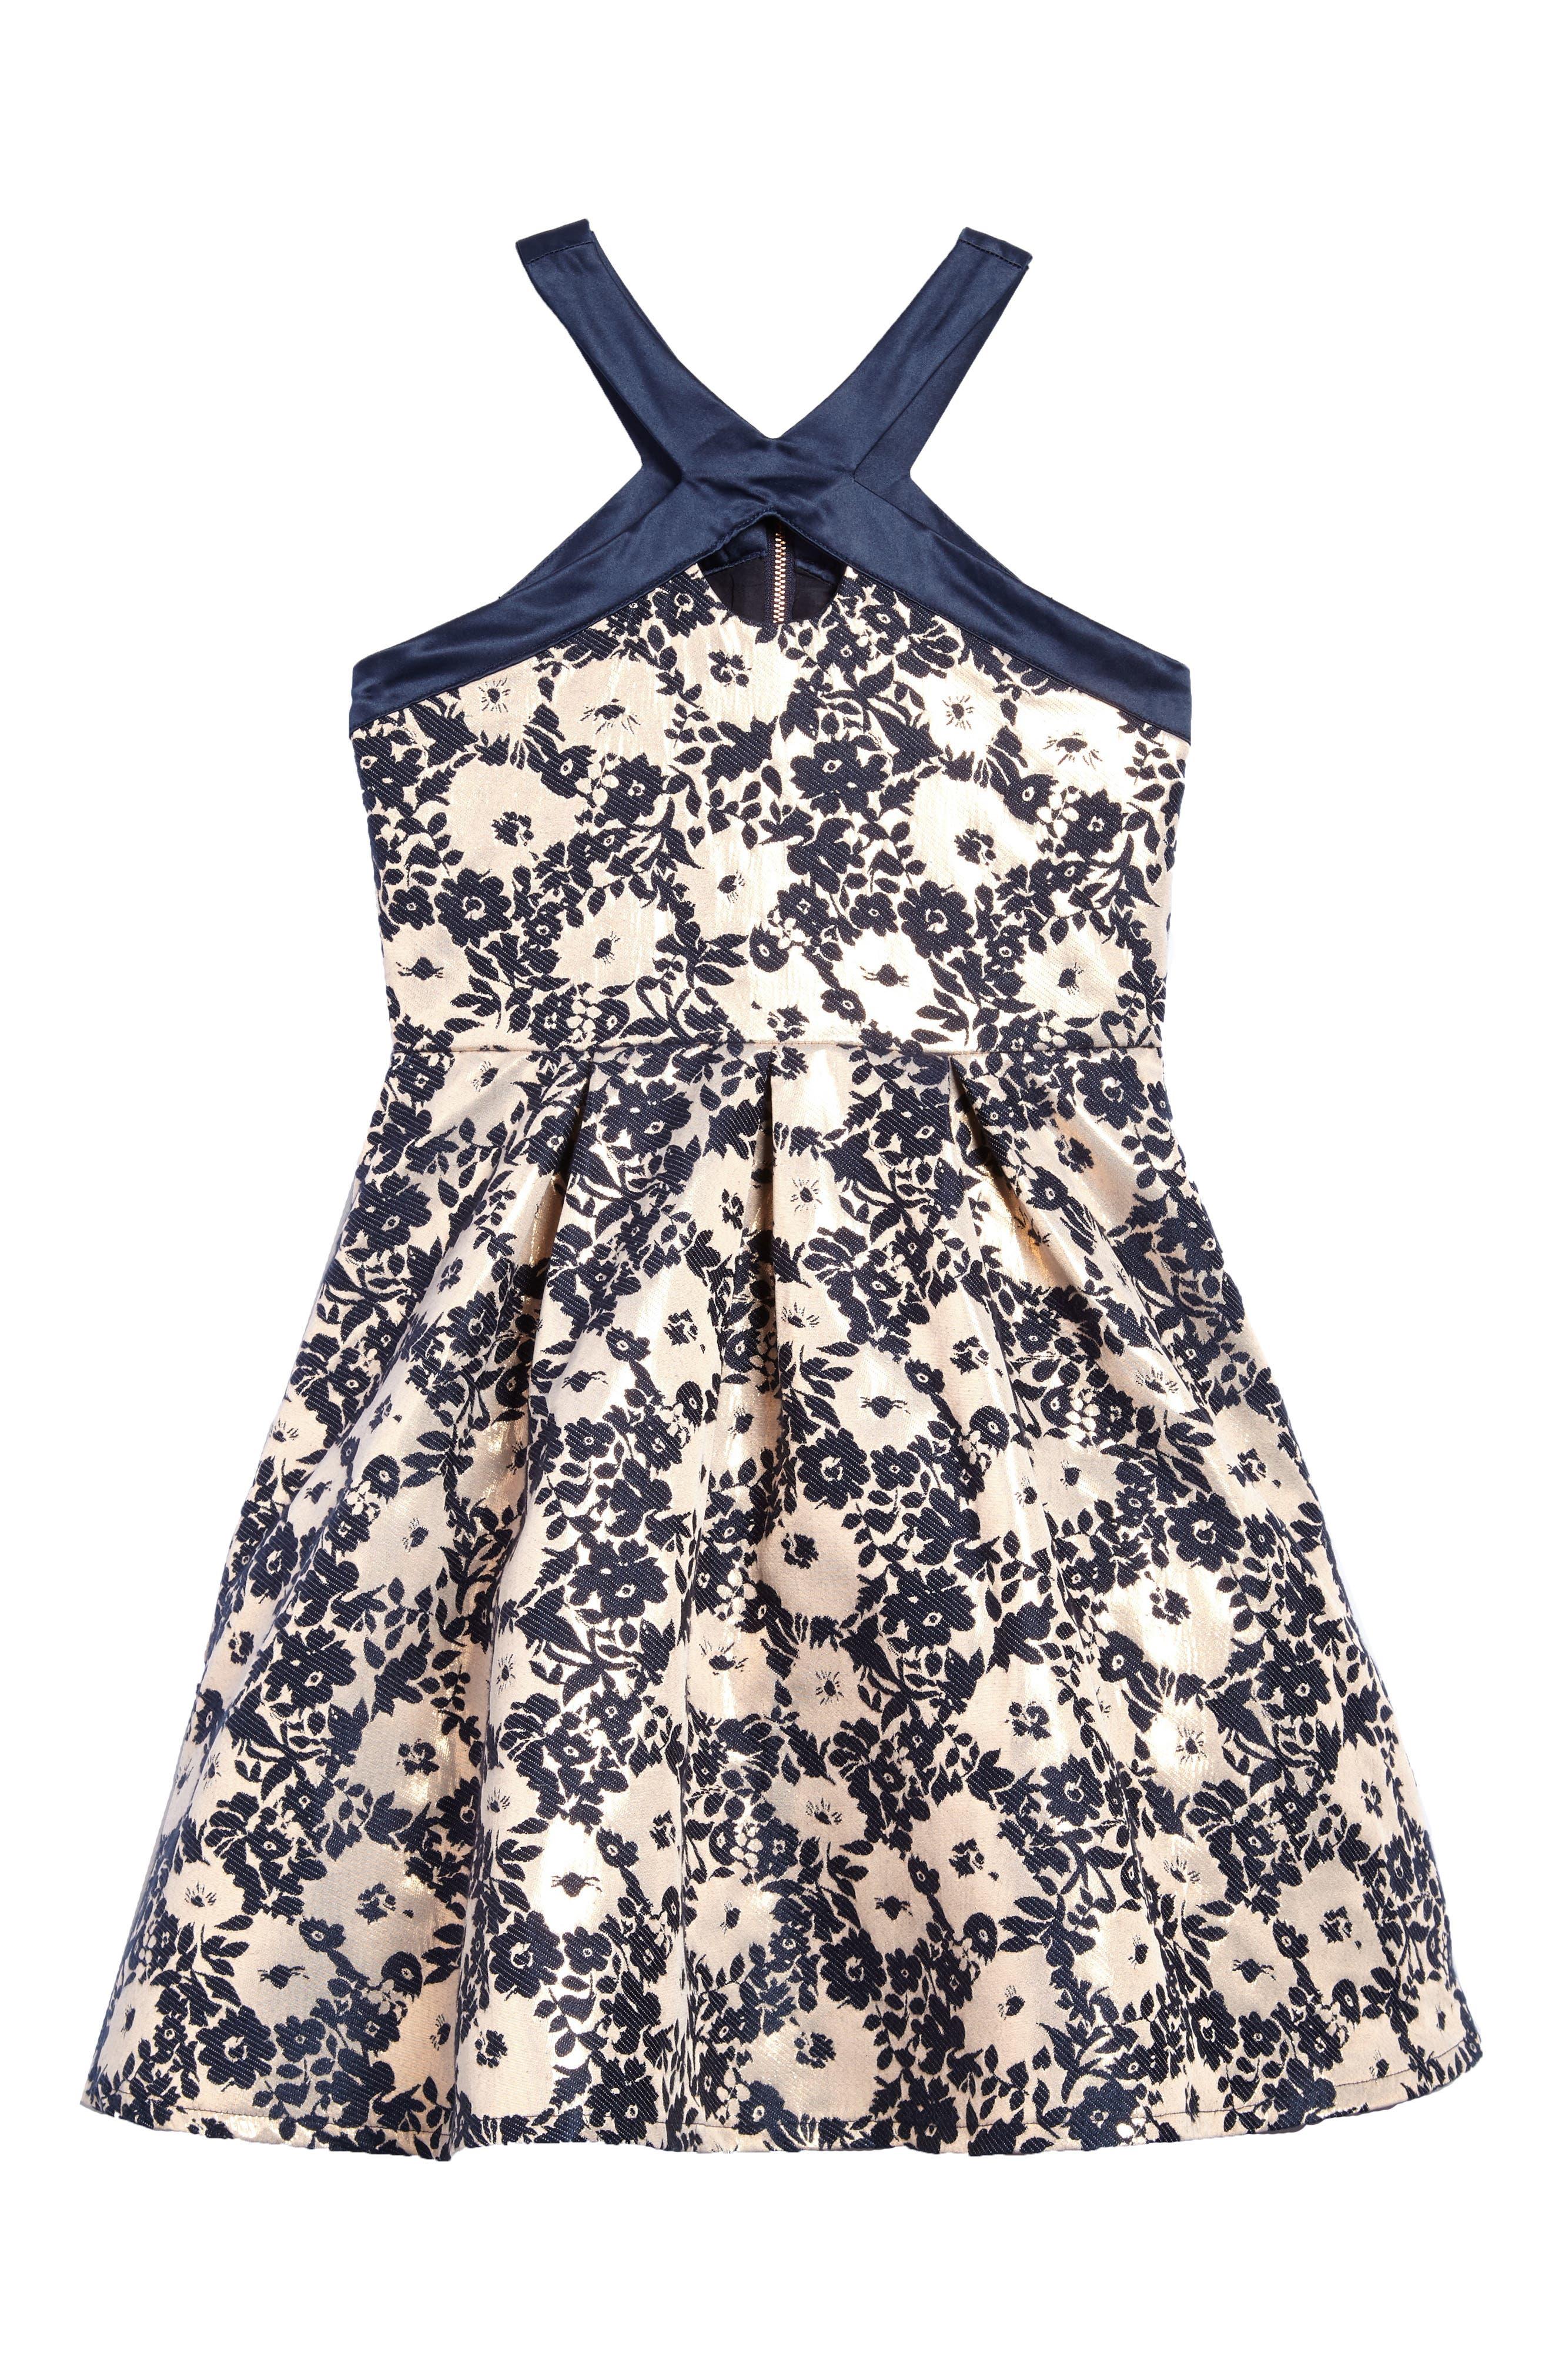 Alternate Image 1 Selected - BLUSH by Us Angels Floral Brocade Fit & Flare Dress (Big Girls)